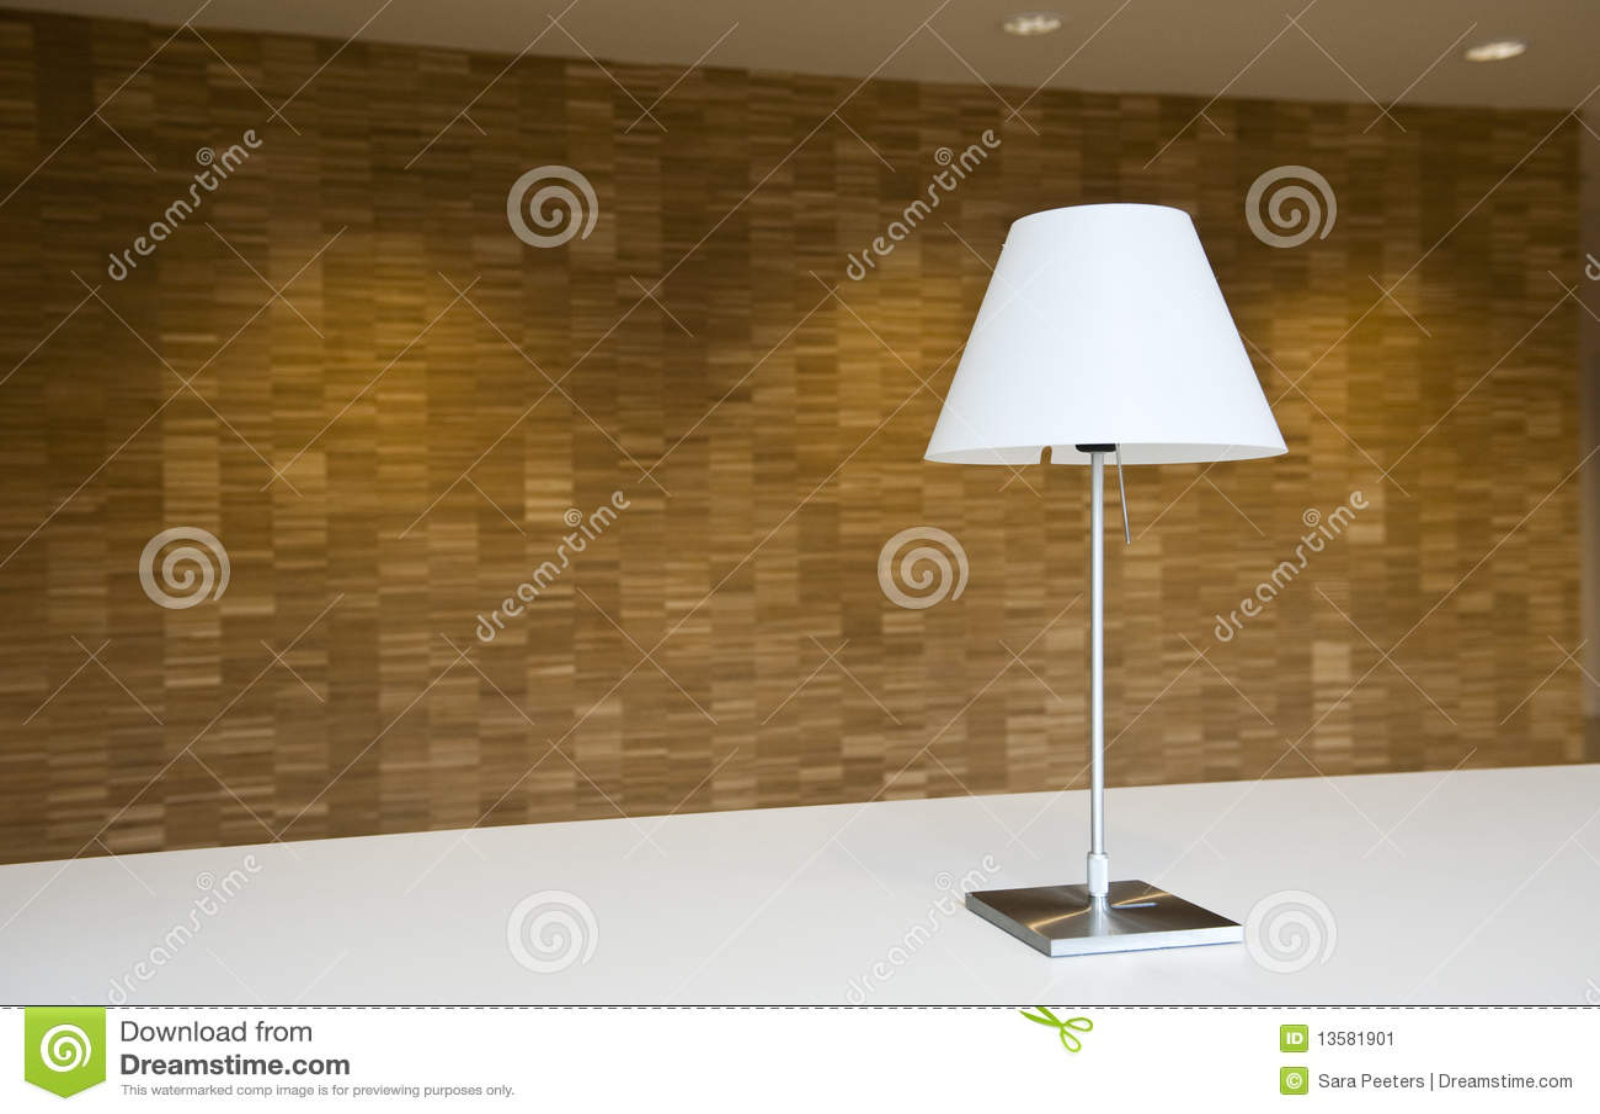 Lampe et mur